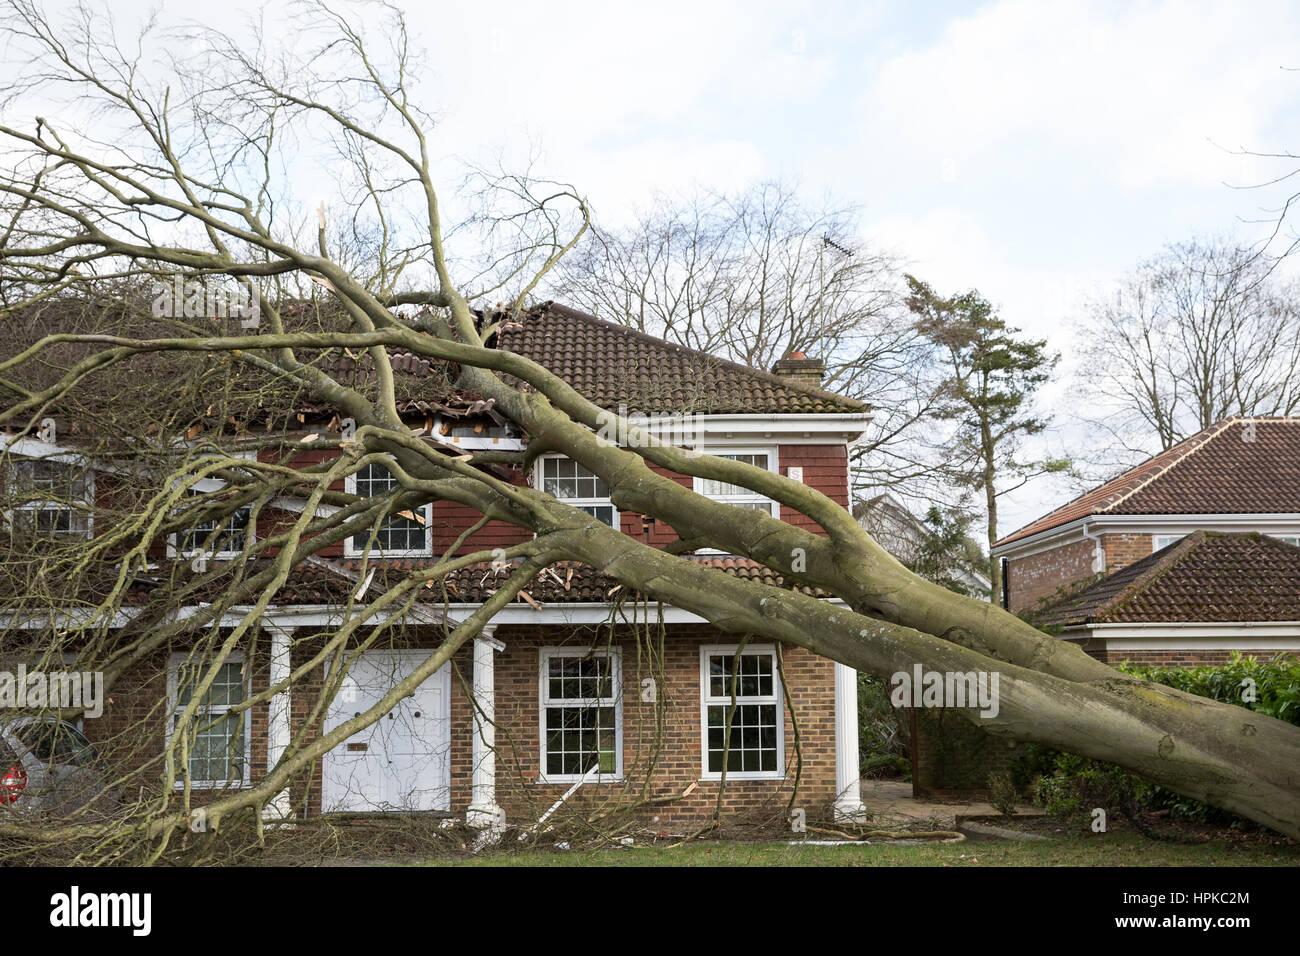 maidenhead-uk-23rd-feb-2017-a-large-tree